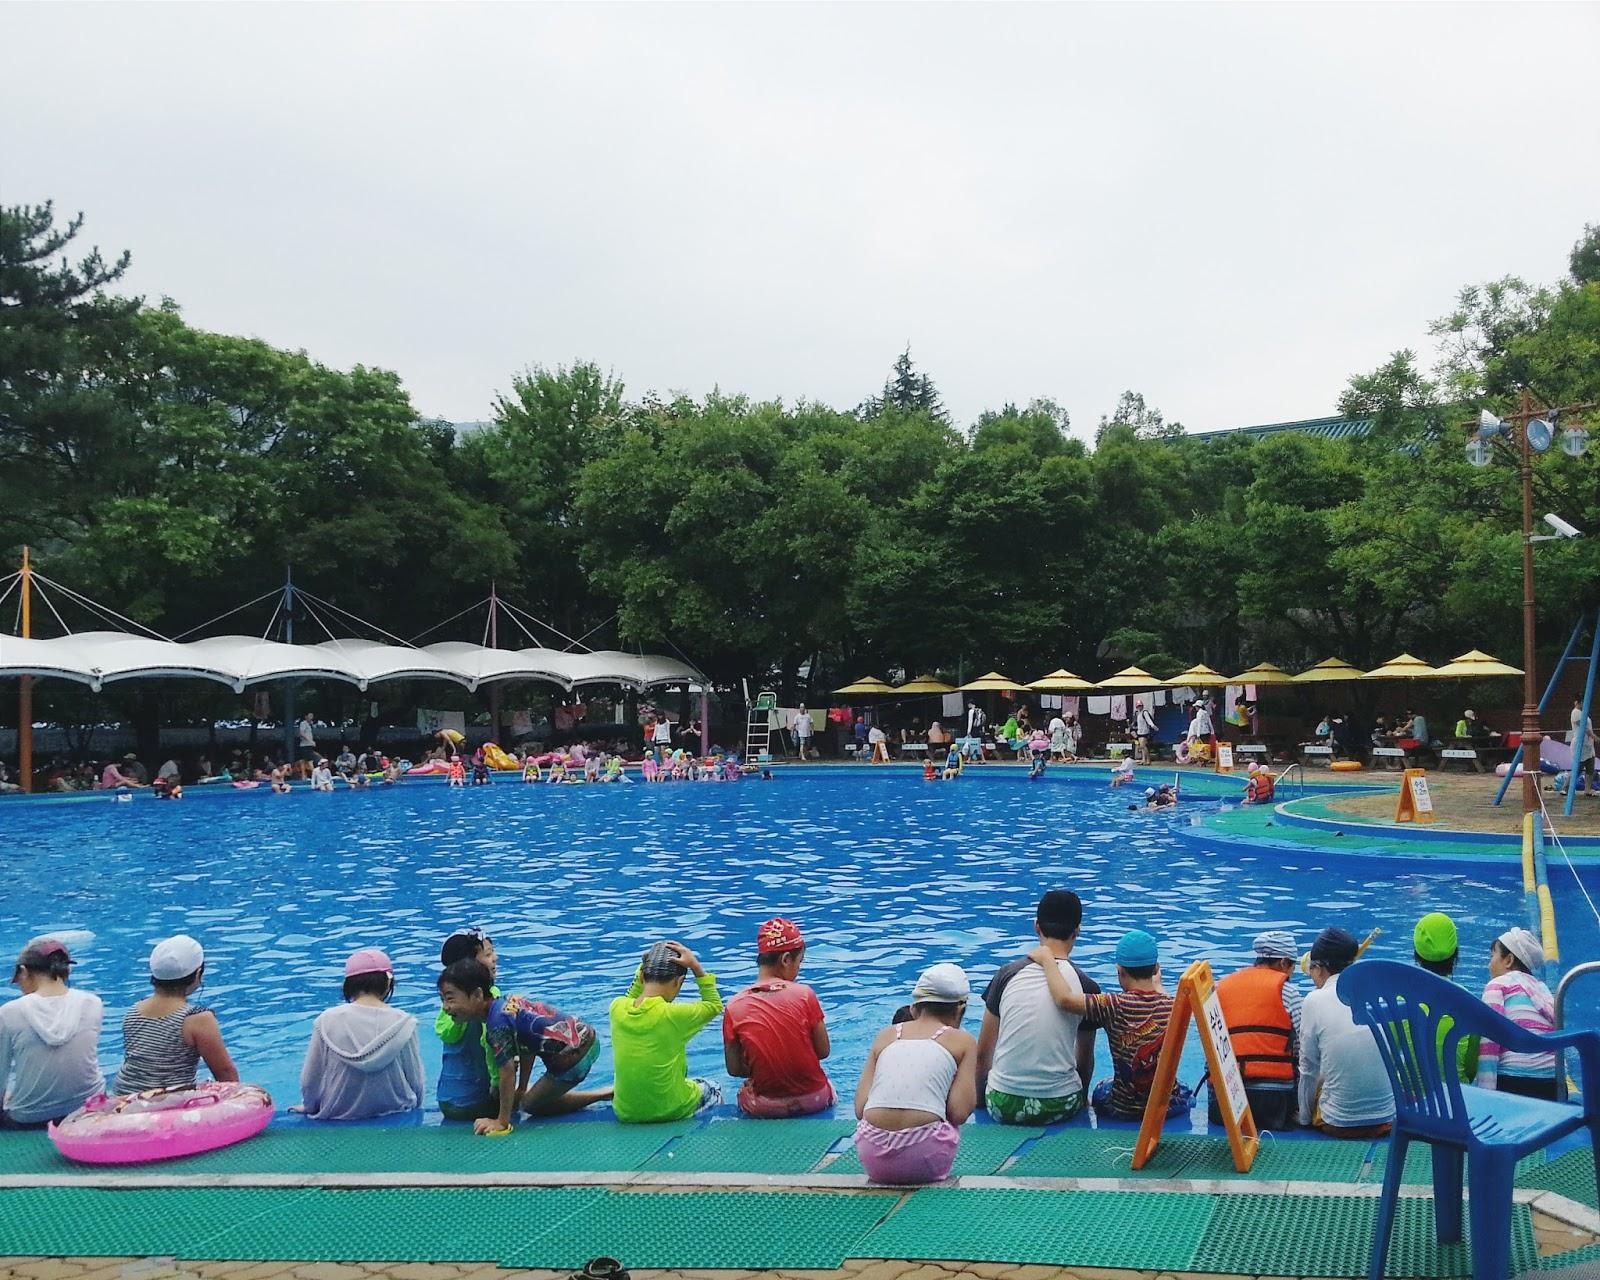 Touch daegu duryu park outdoor swimming pool for Outdoor swimming pool